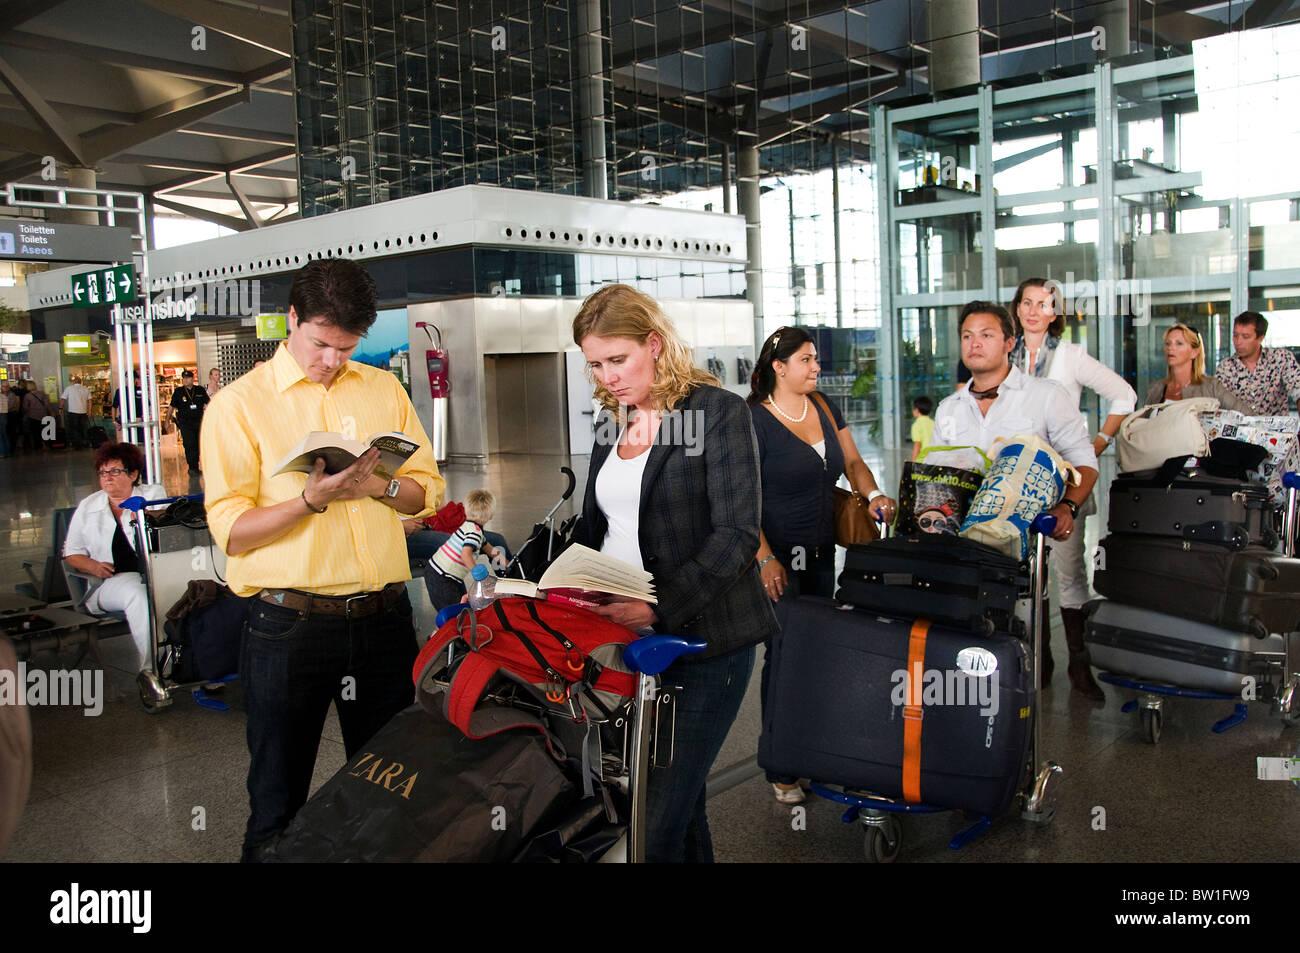 Airport Malaga people waiting luggage Spain Spanish - Stock Image